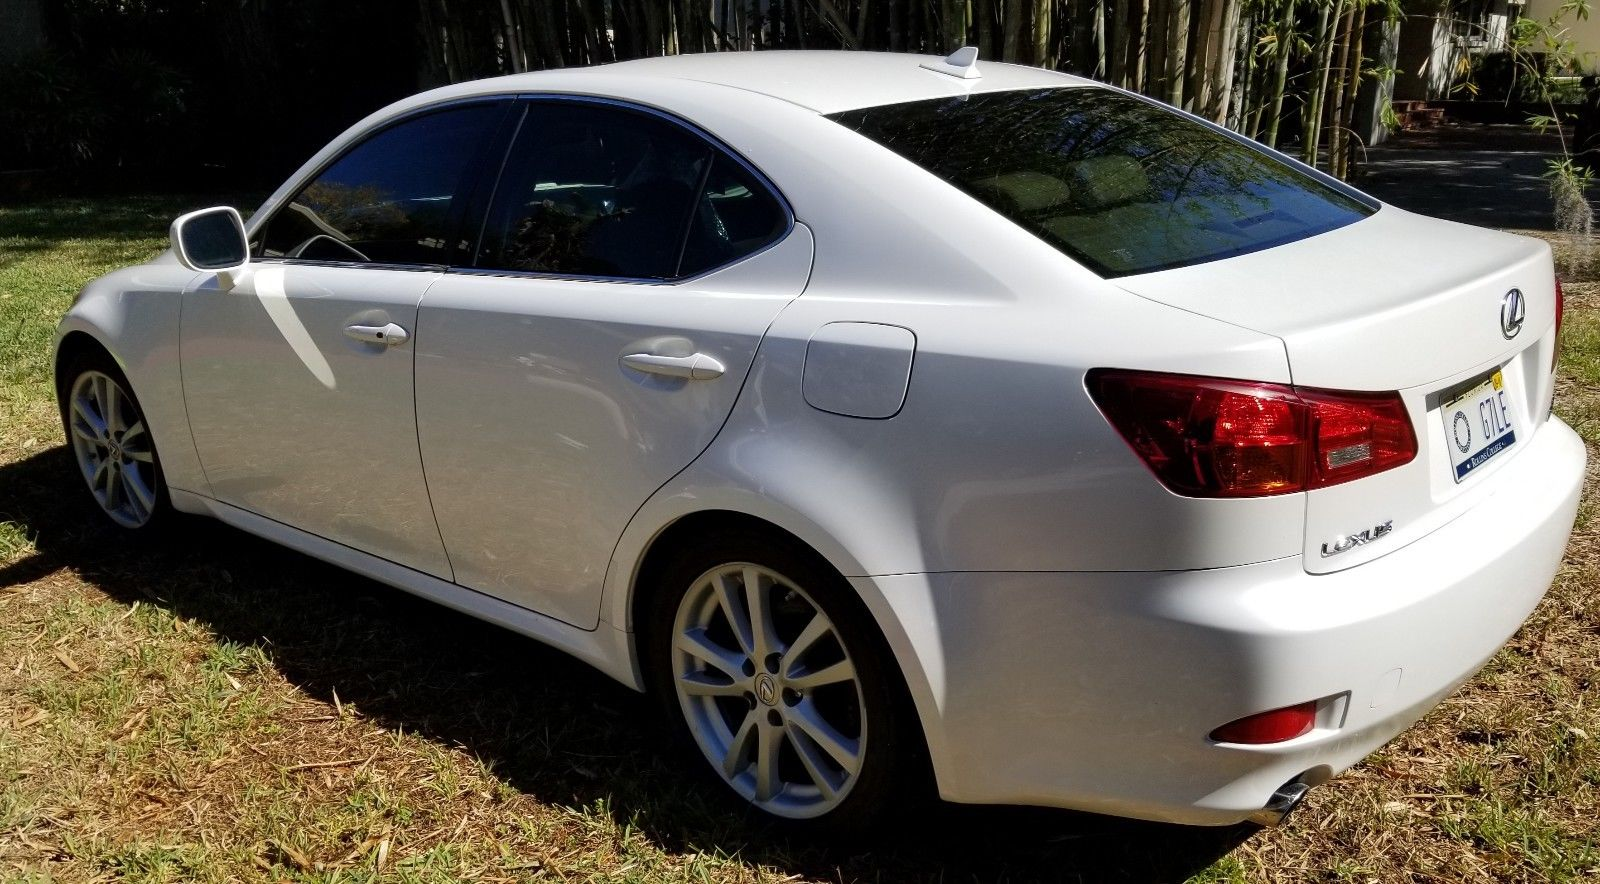 Amazing 2007 Lexus IS Luxury Package 2007 Lexus IS250, White, V6, A/T,  Loaded Luxury Pkg, Clean Title,Nav, 168K Miles 2019